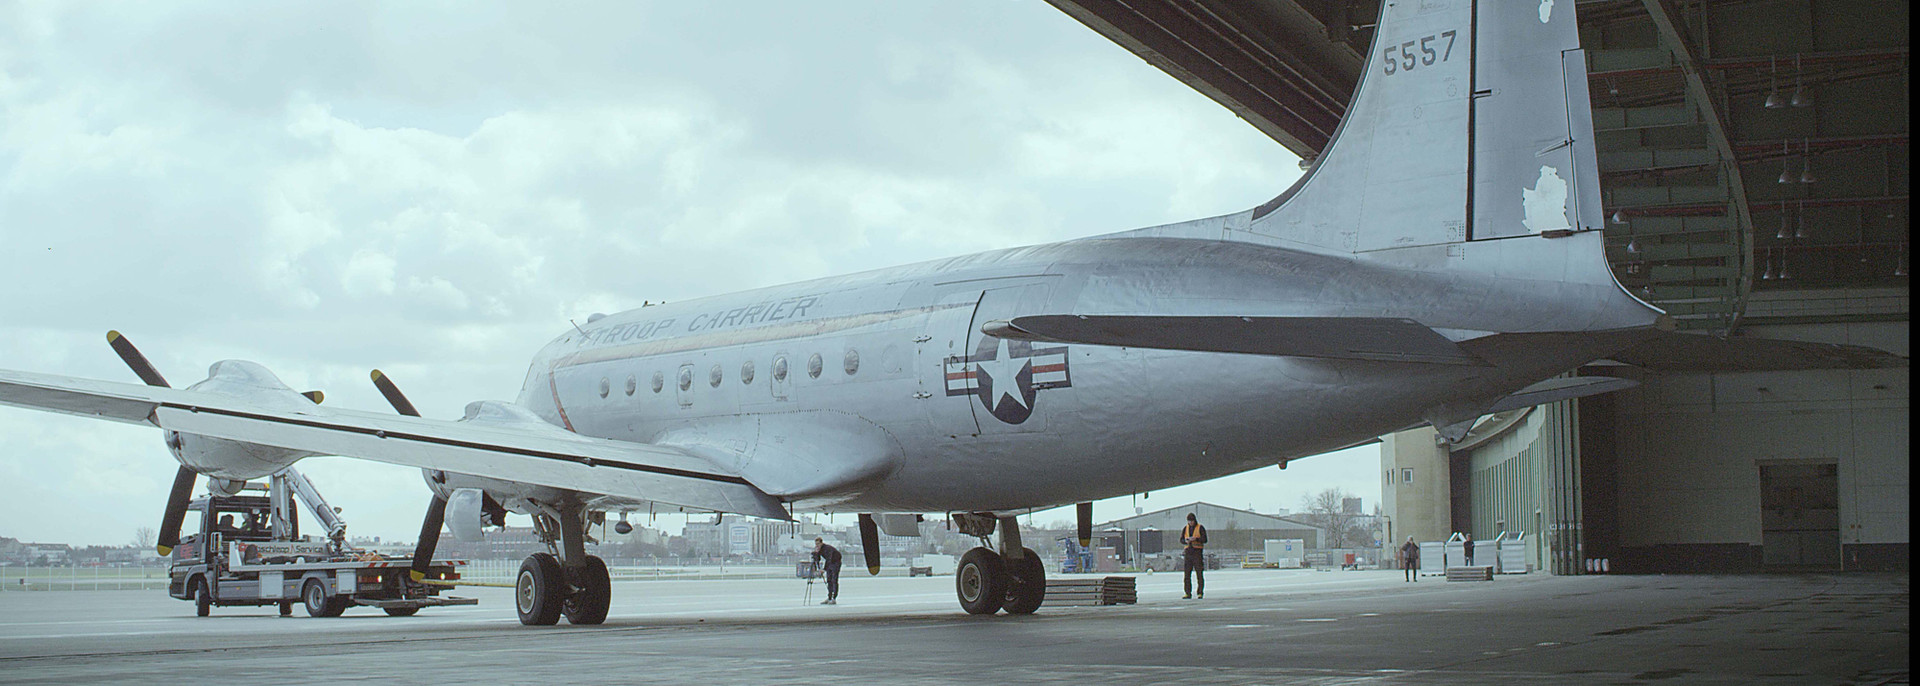 70 Years Berlin Airlift